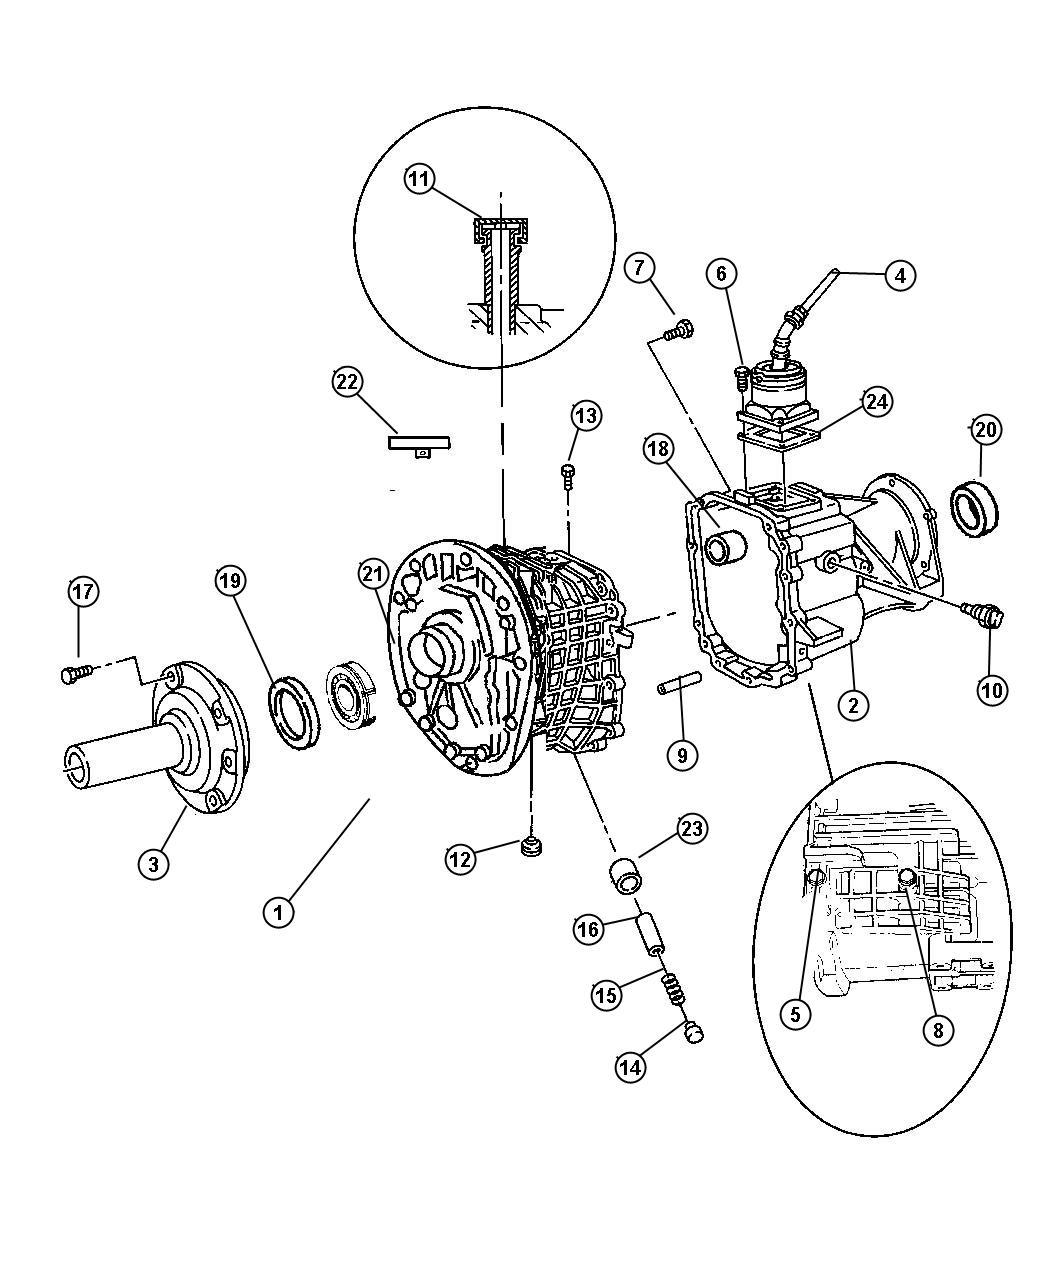 1998 Dodge Ram 1500 Seal. Output shaft. 52108101ab